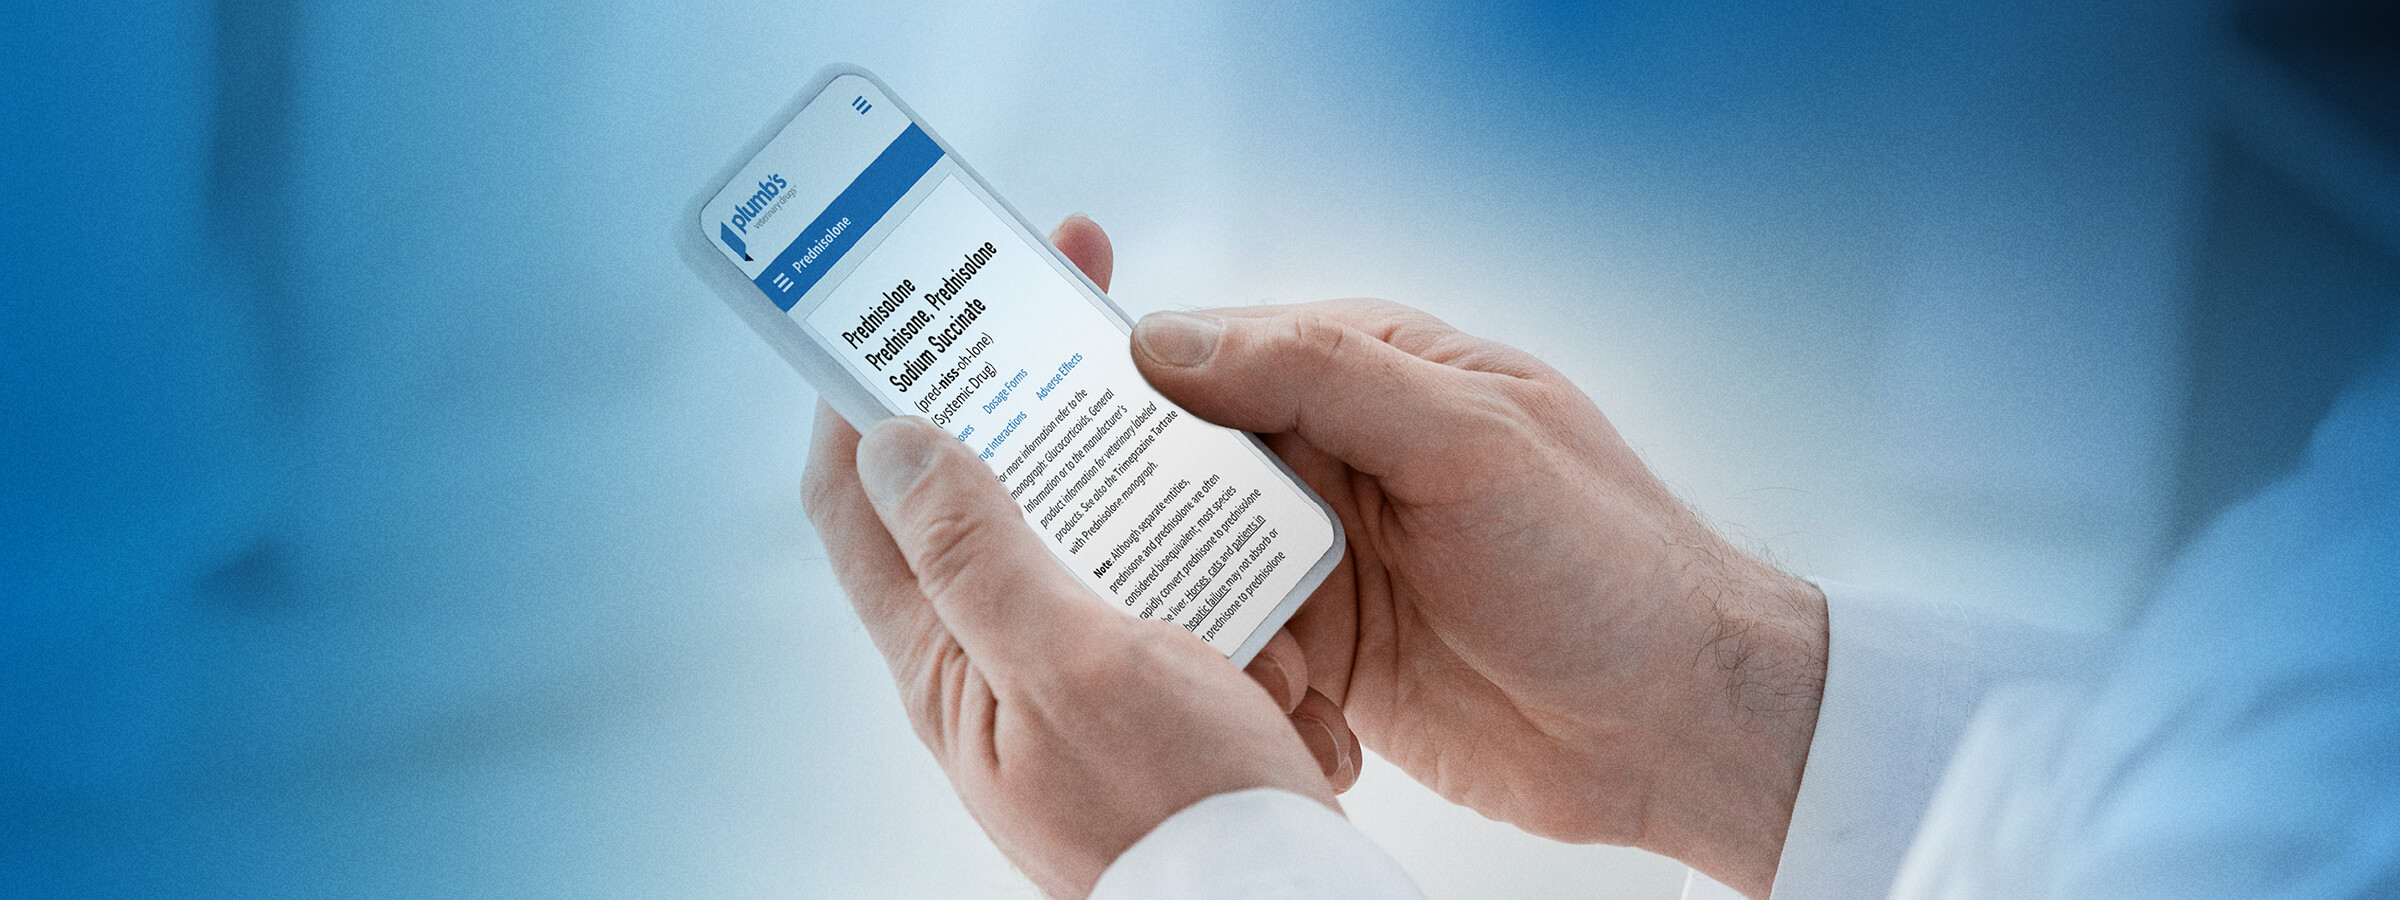 First-Ever Plumb's Veterinary Drugs Mobile App Revolutionizes Veterinary Practice